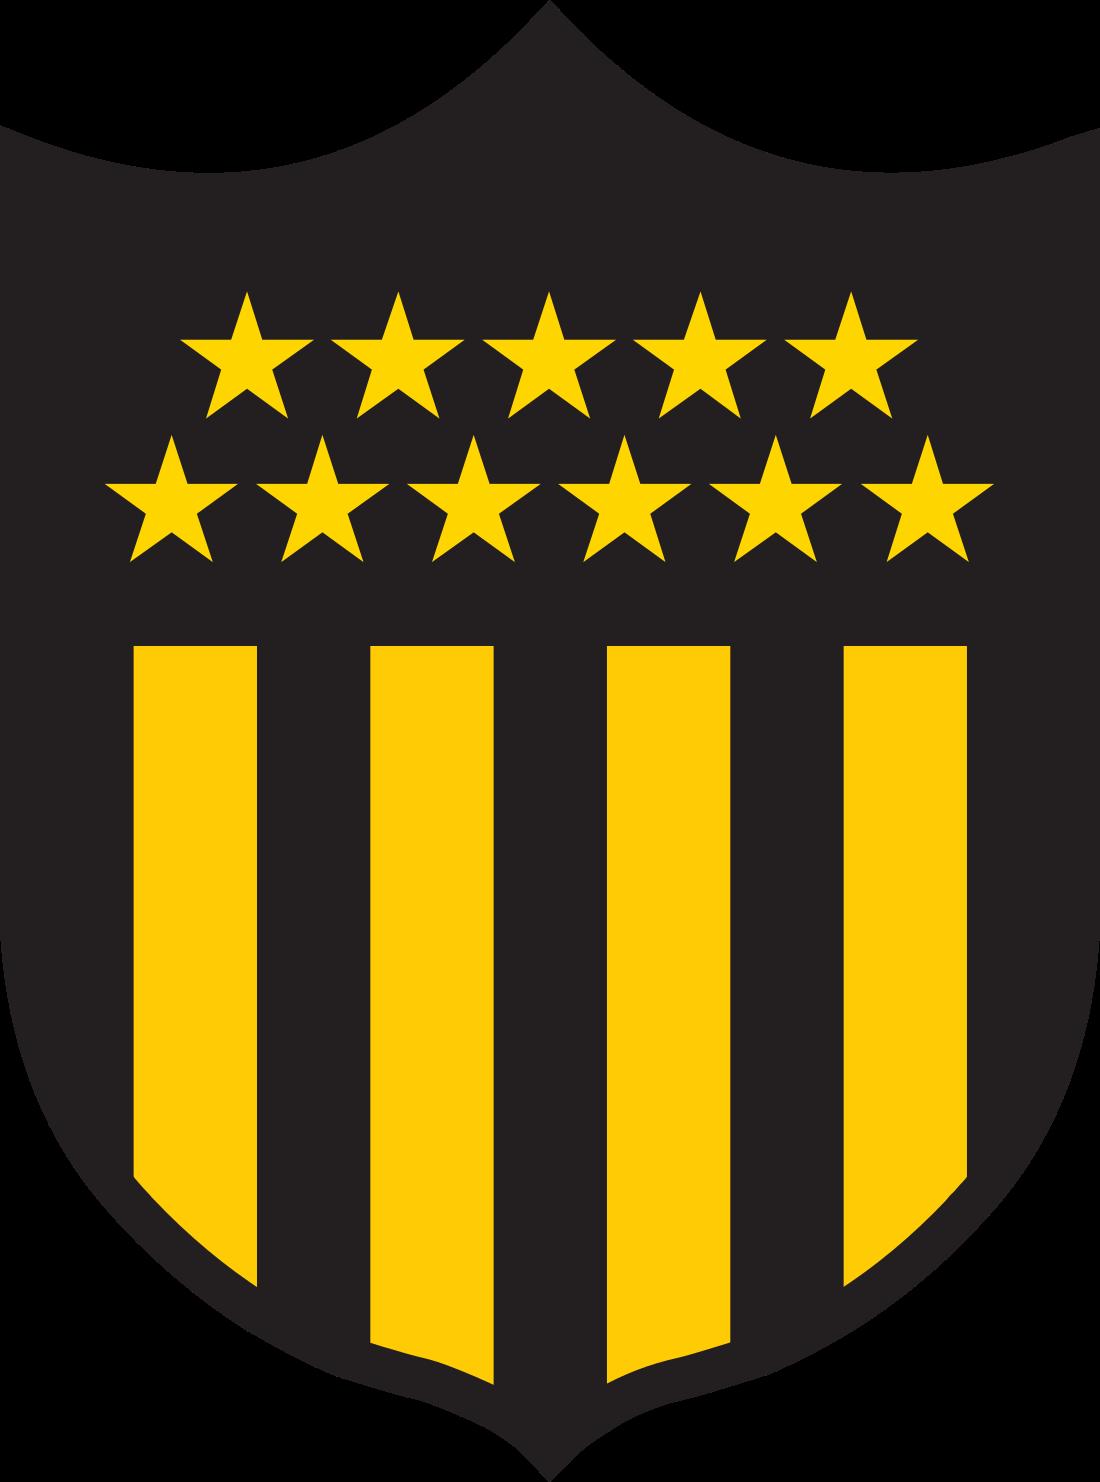 [Imagen: penarol-logo-escudo-7.png]